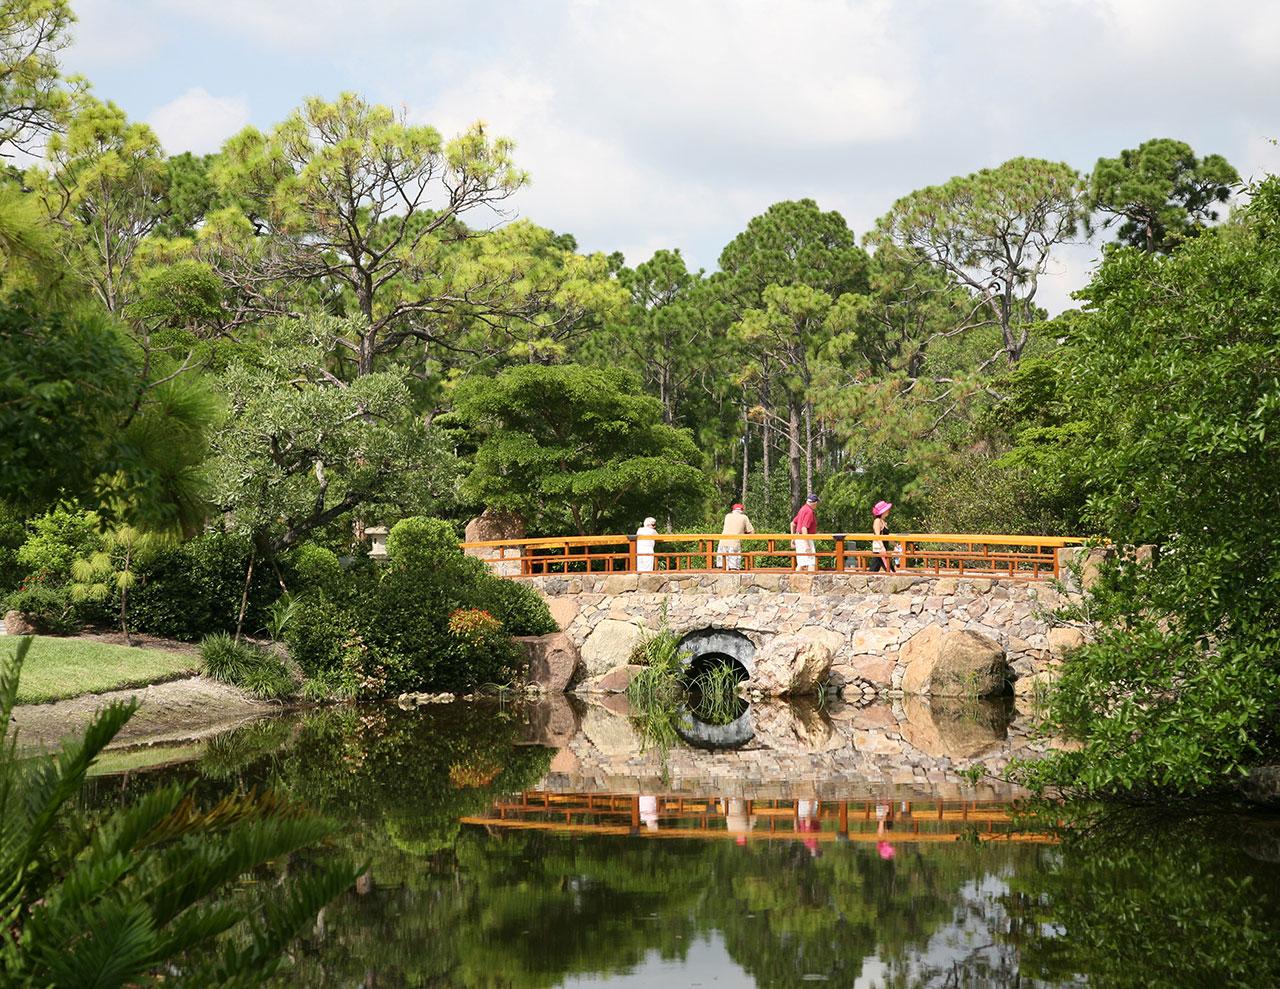 Sushi & Stroll – Morikami Museum and Japanese Gardens